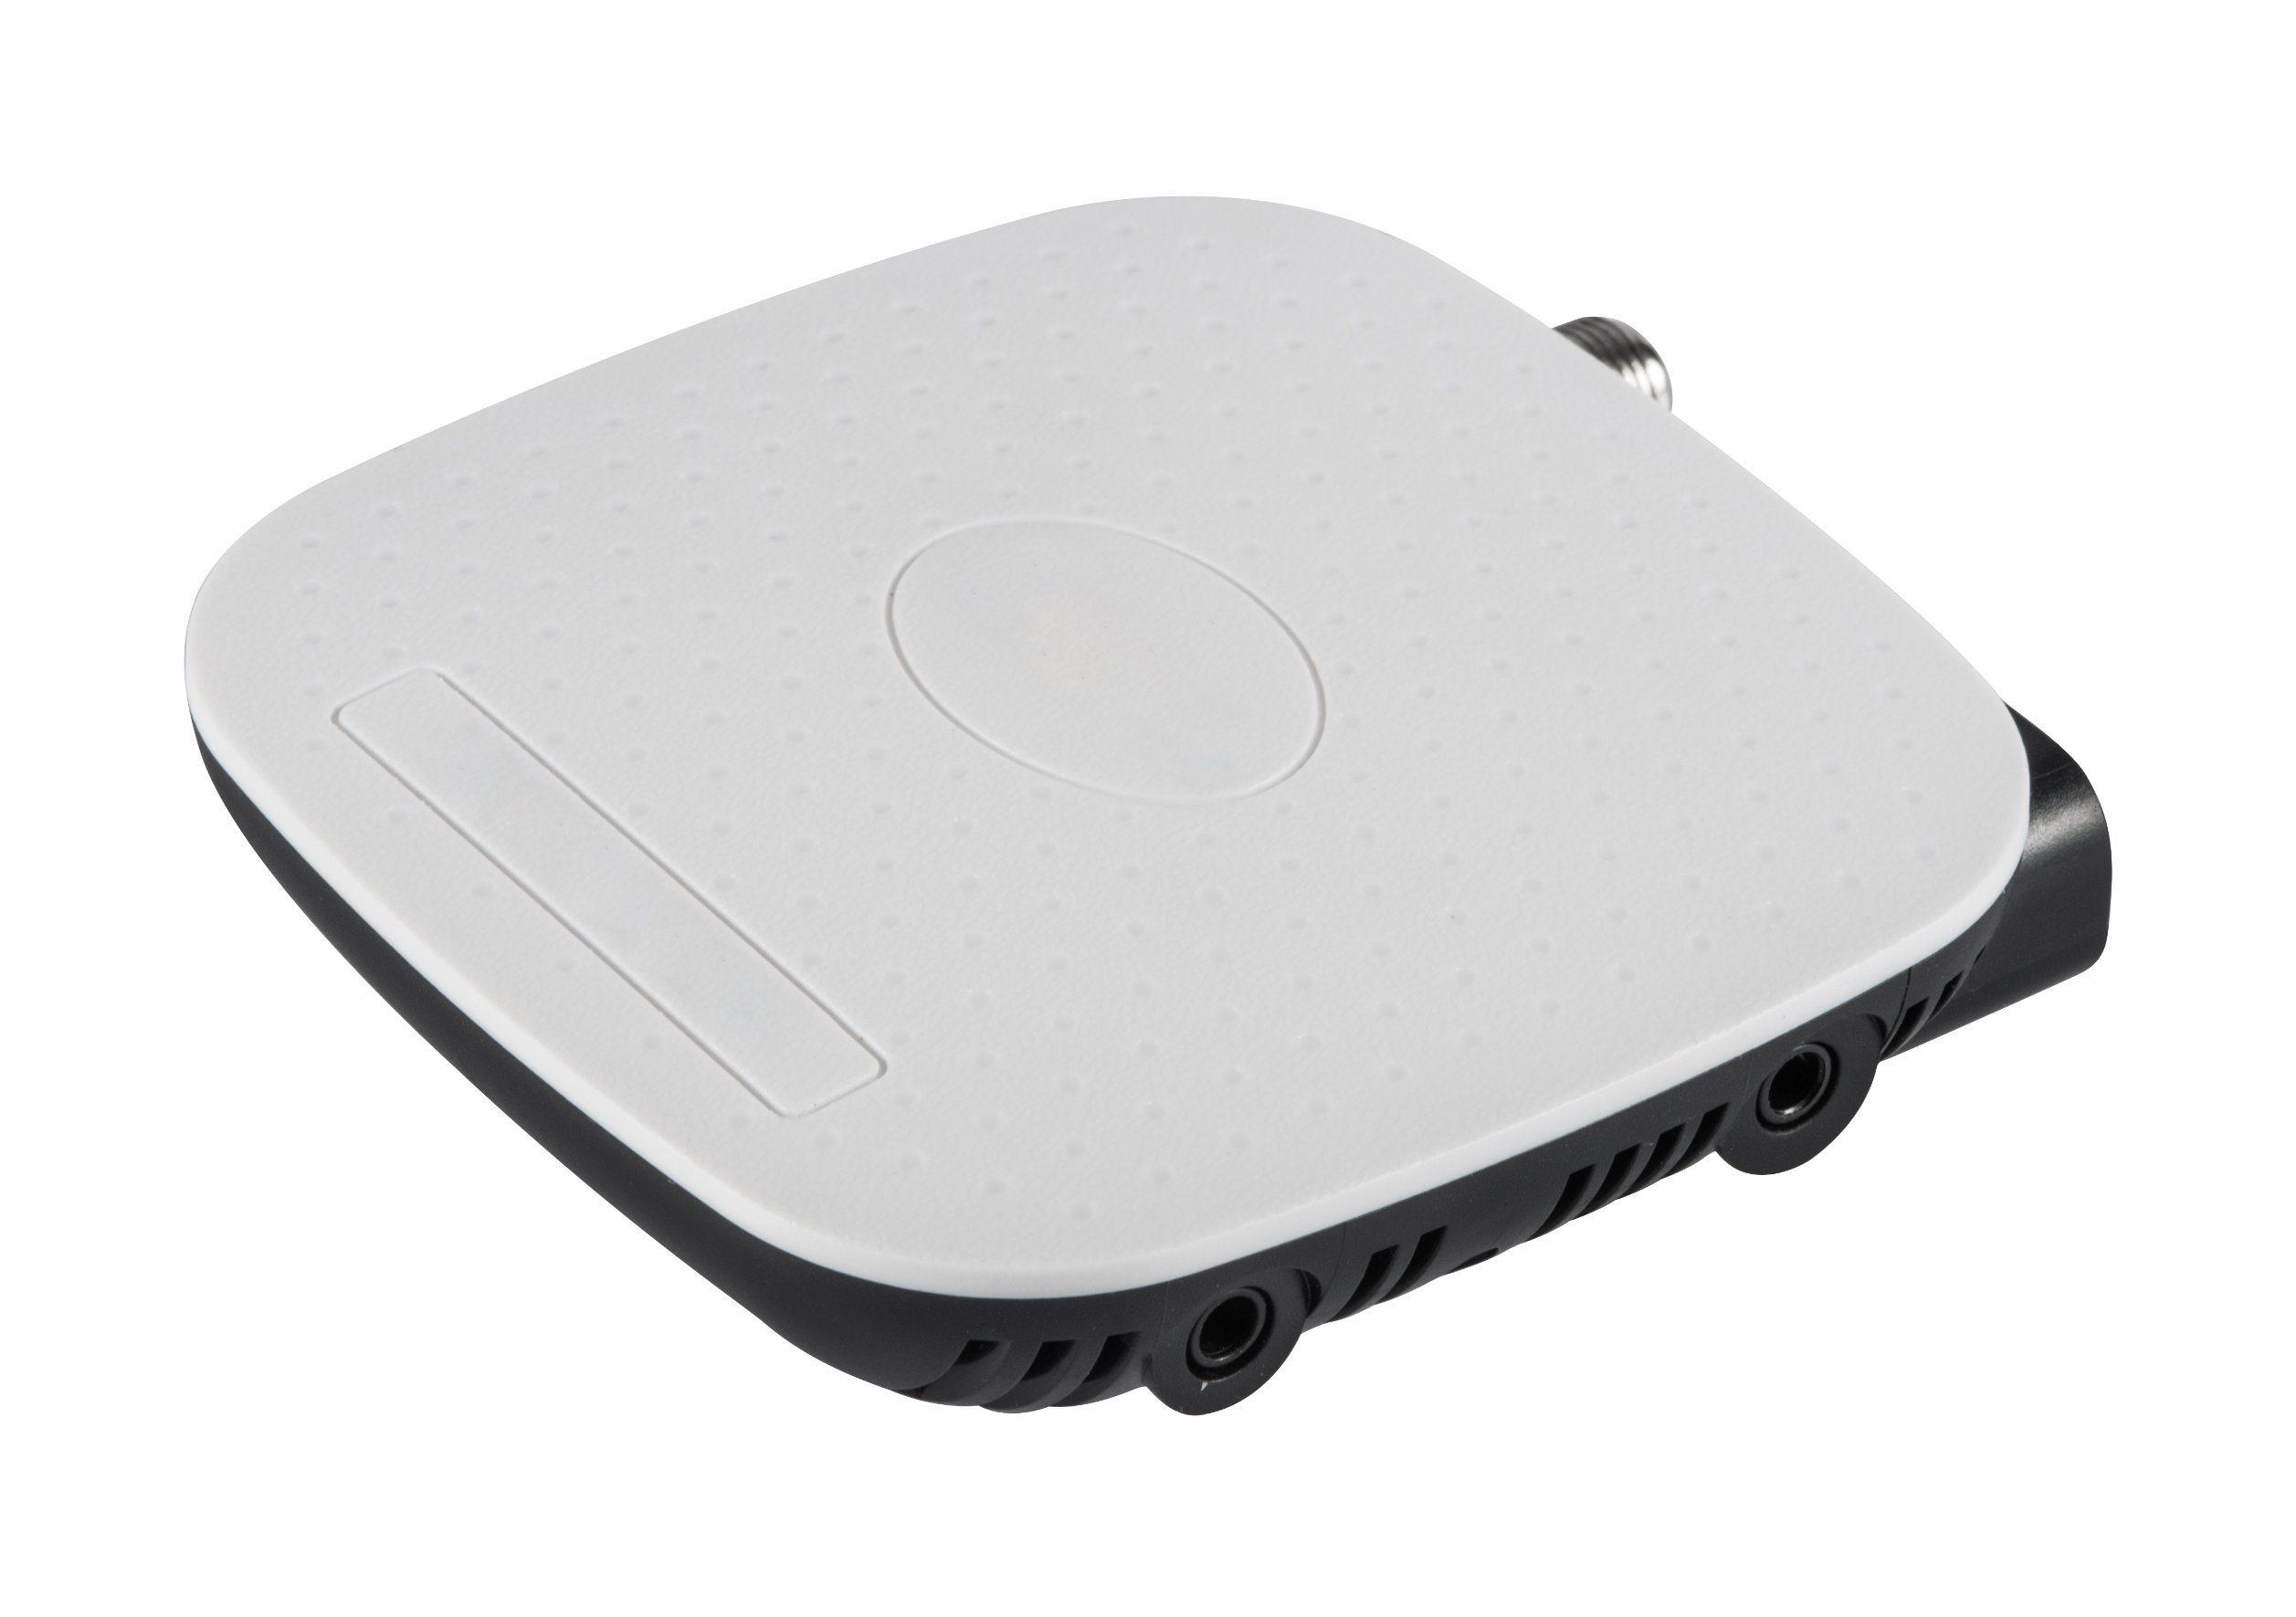 New Mini DVB S2 Tuner Satellite Receiver